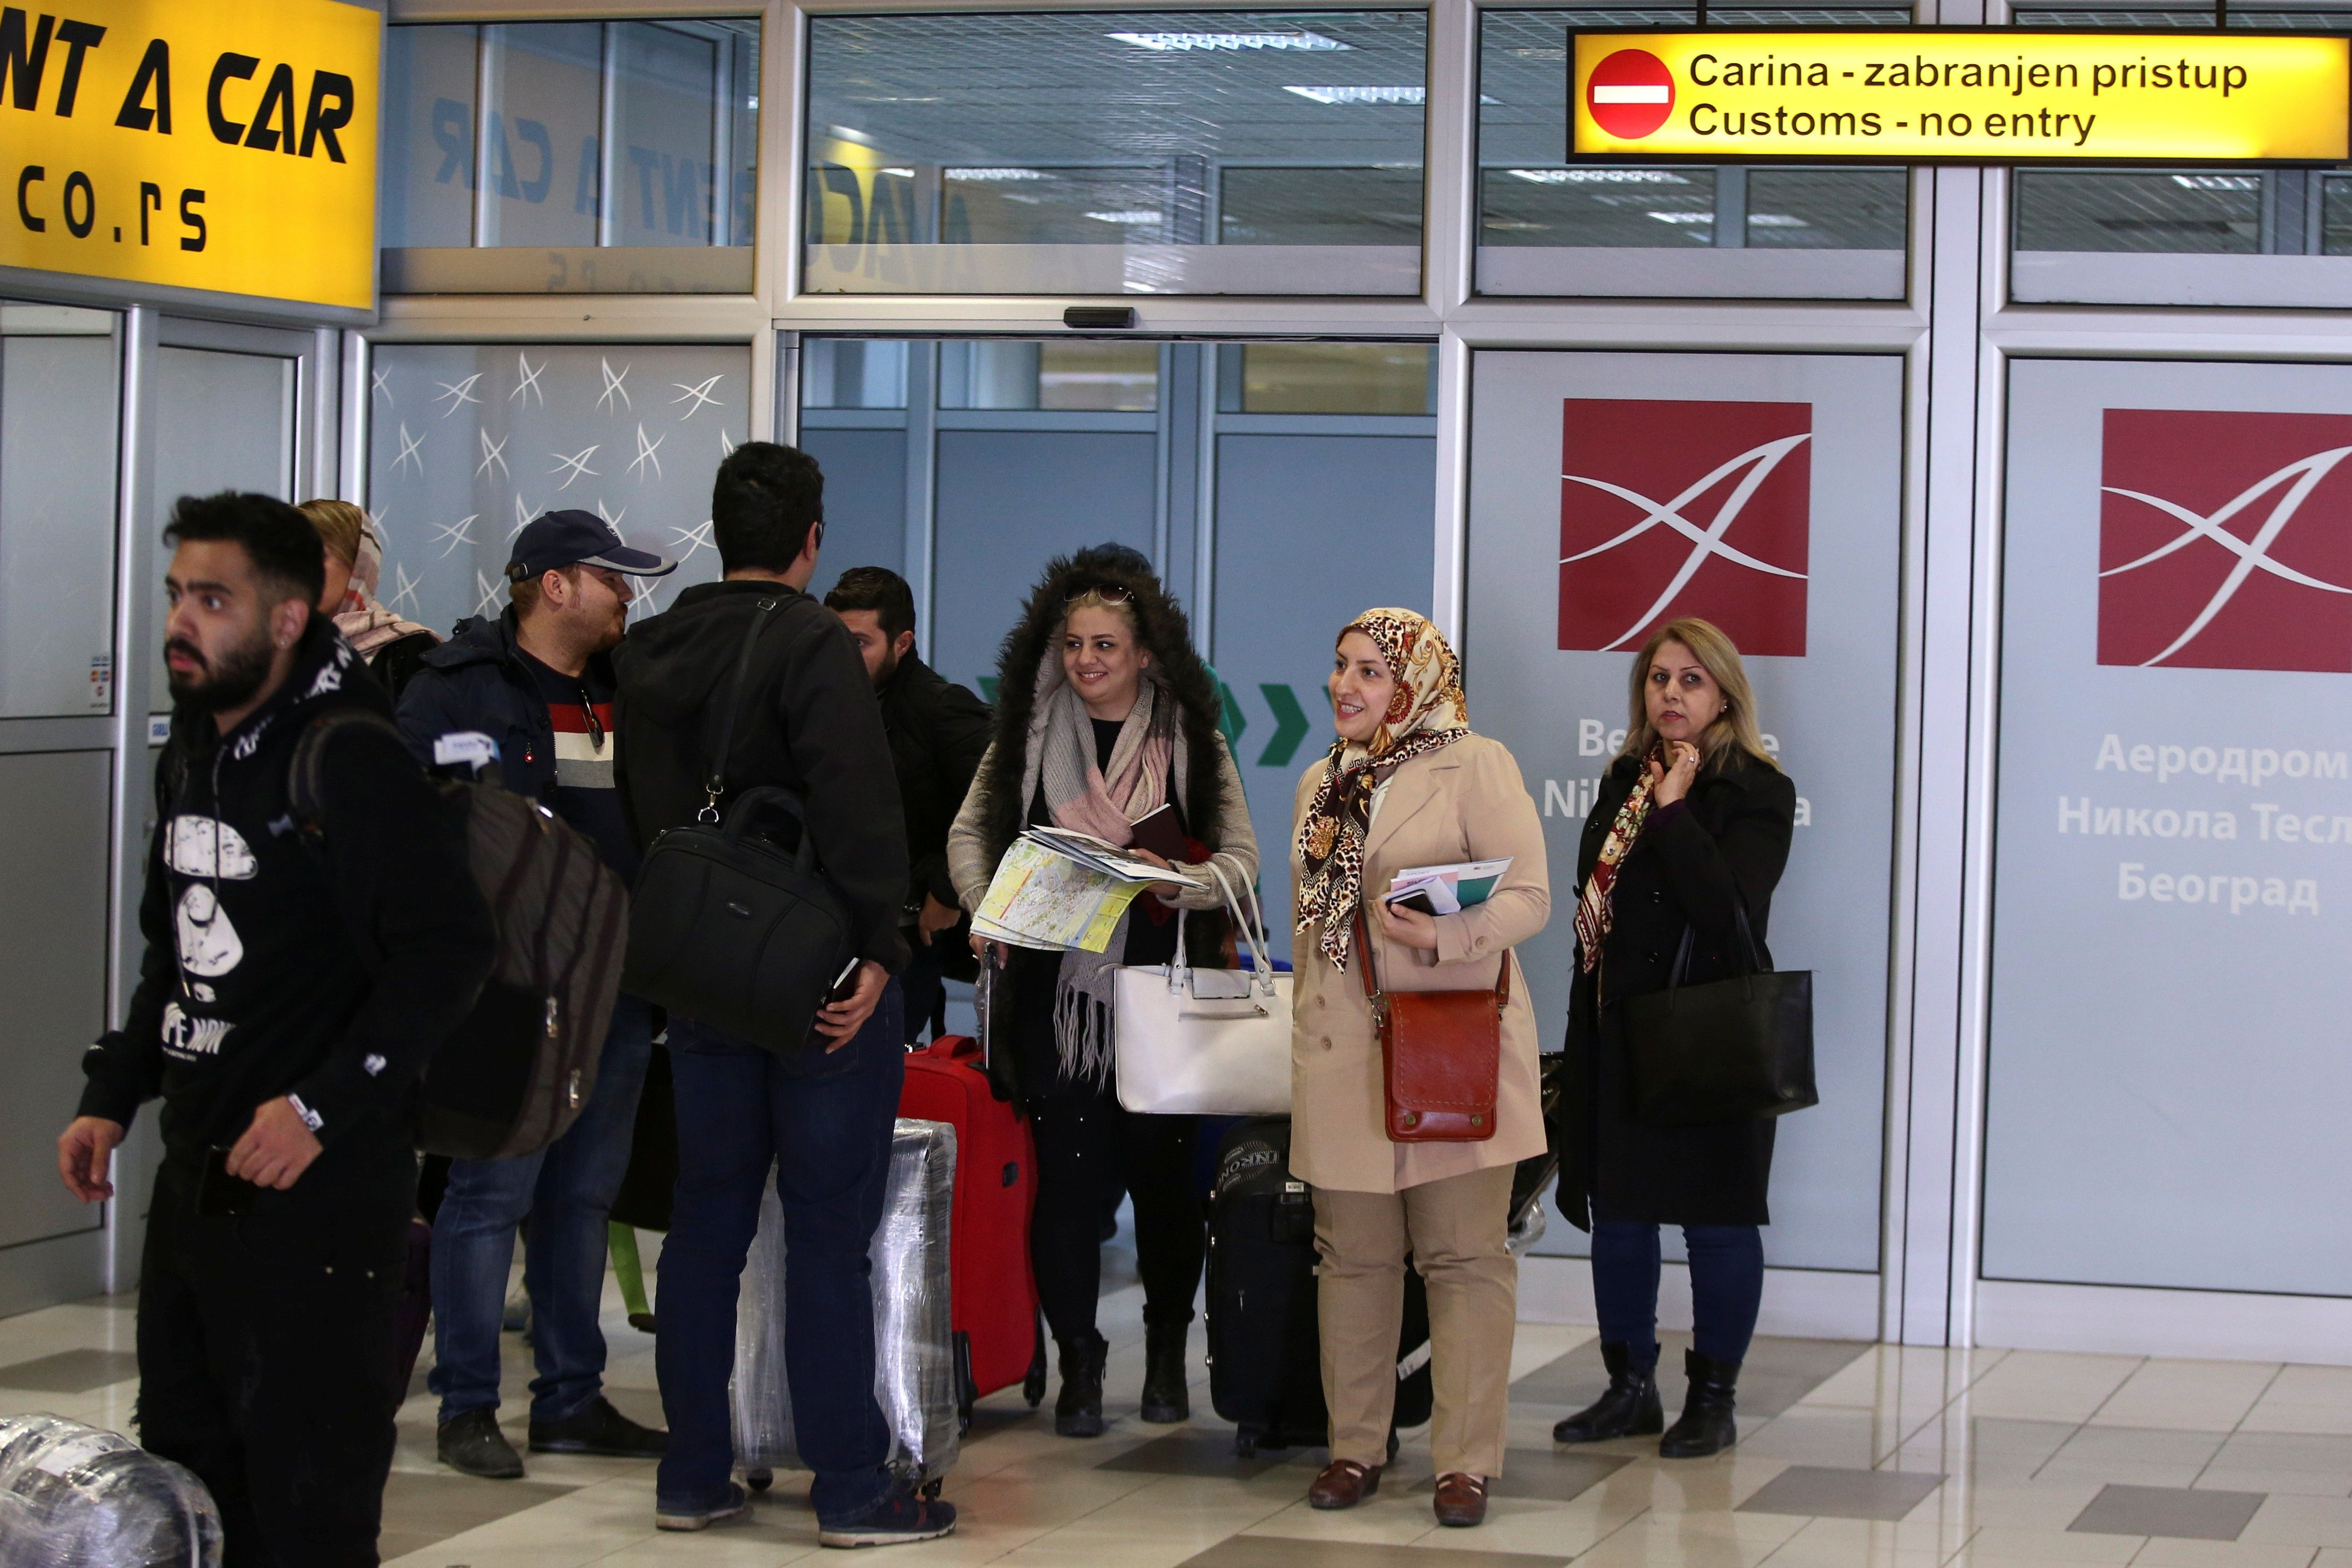 2018-03-13T111154Z_1596468070_RC168E94B400_RTRMADP_3_SERBIA-IRAN